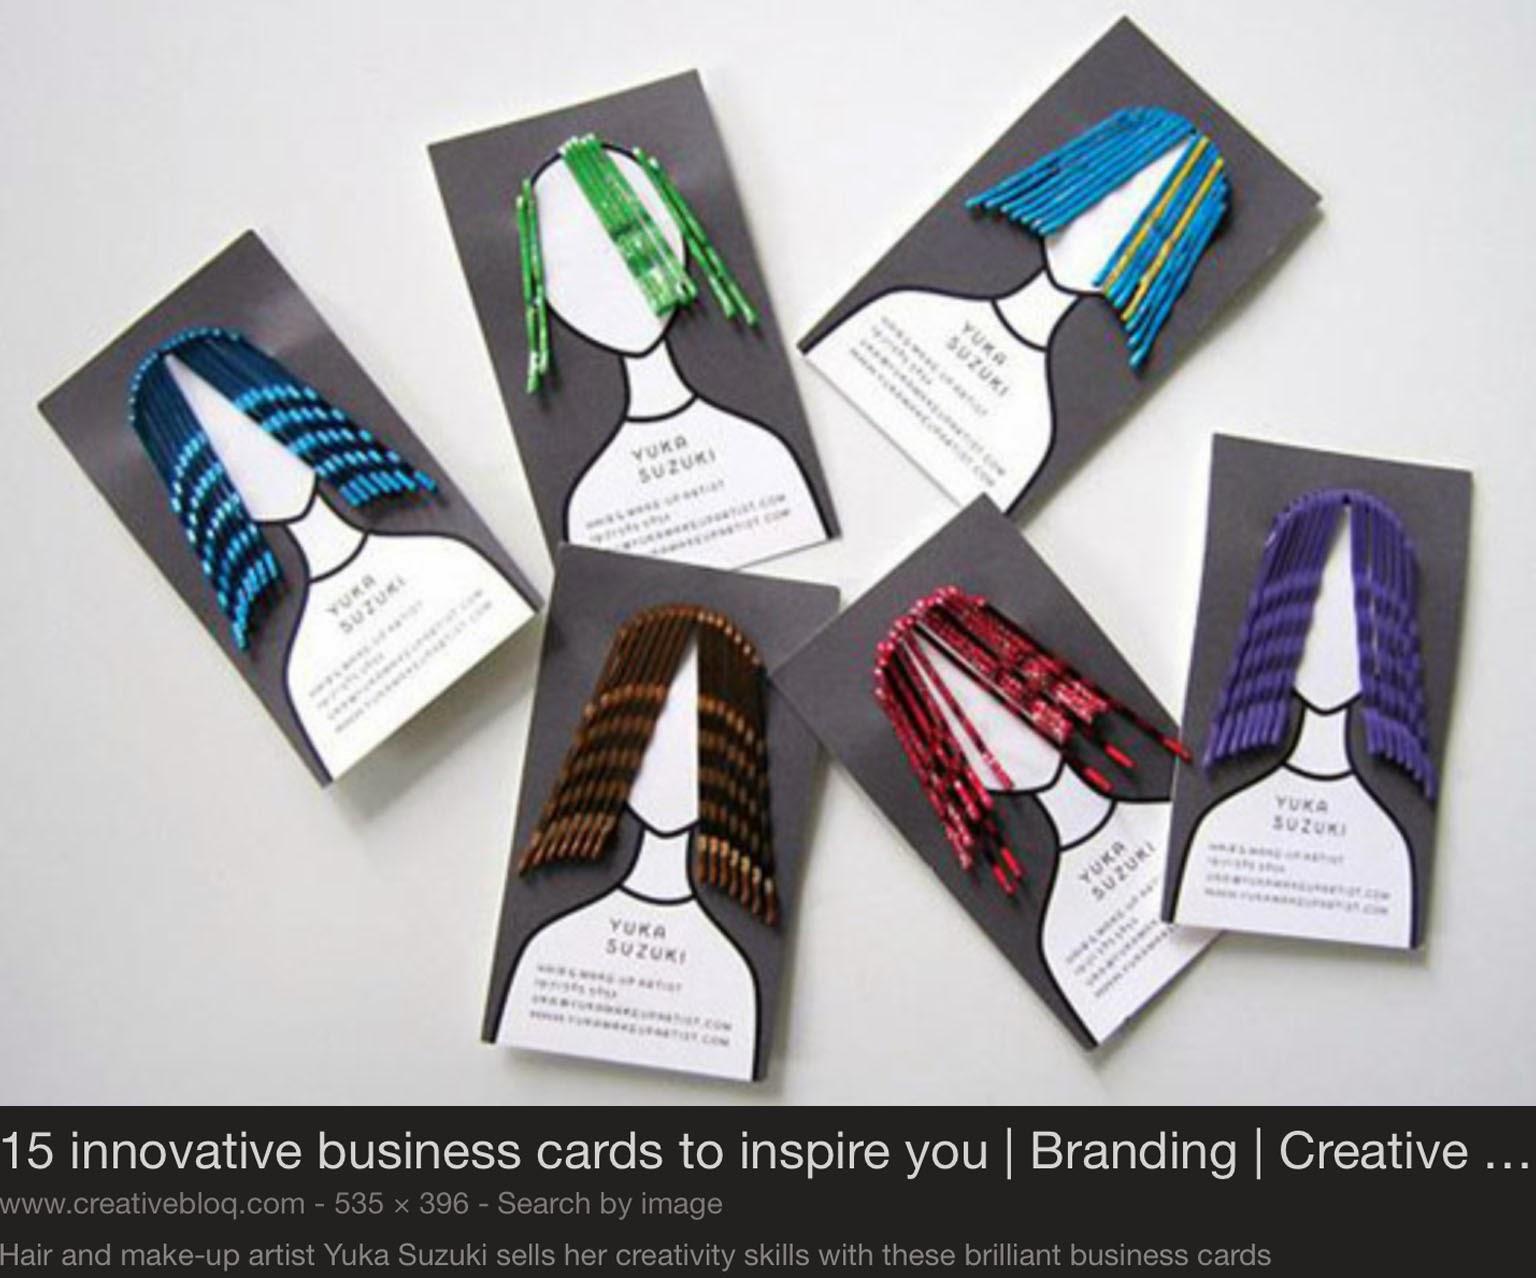 Libby Ward Designer/Maker : My top 10 business cards!